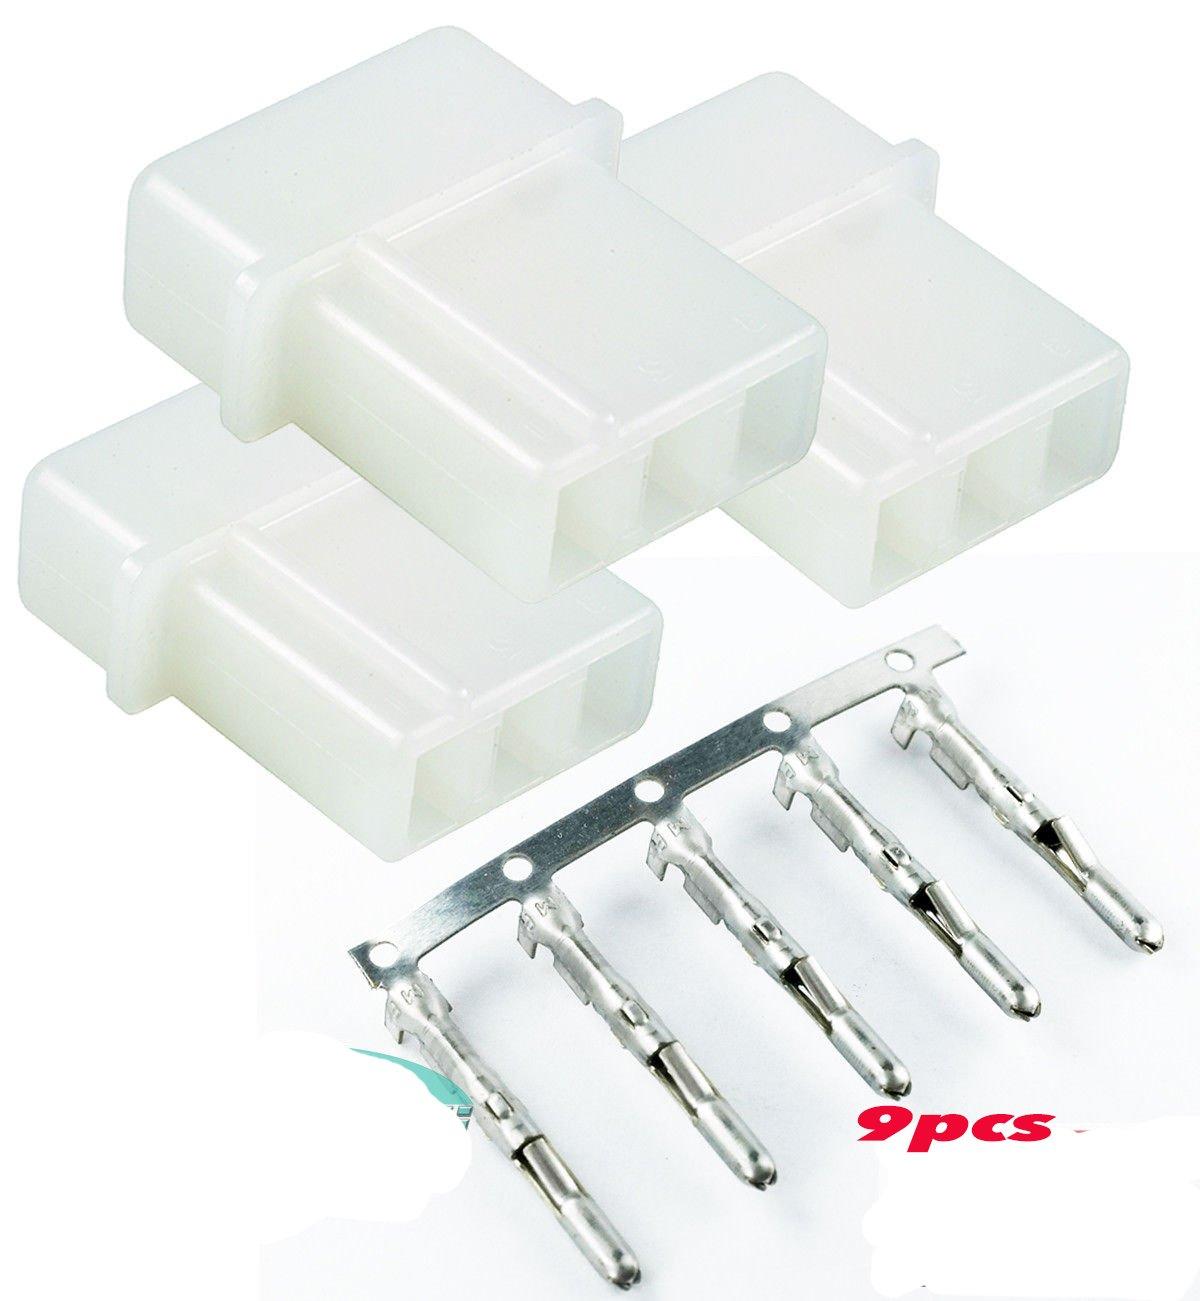 whelen power supply wiring diagram amazon com strobe 3 pin connector amp power supply bulb male and  strobe 3 pin connector amp power supply